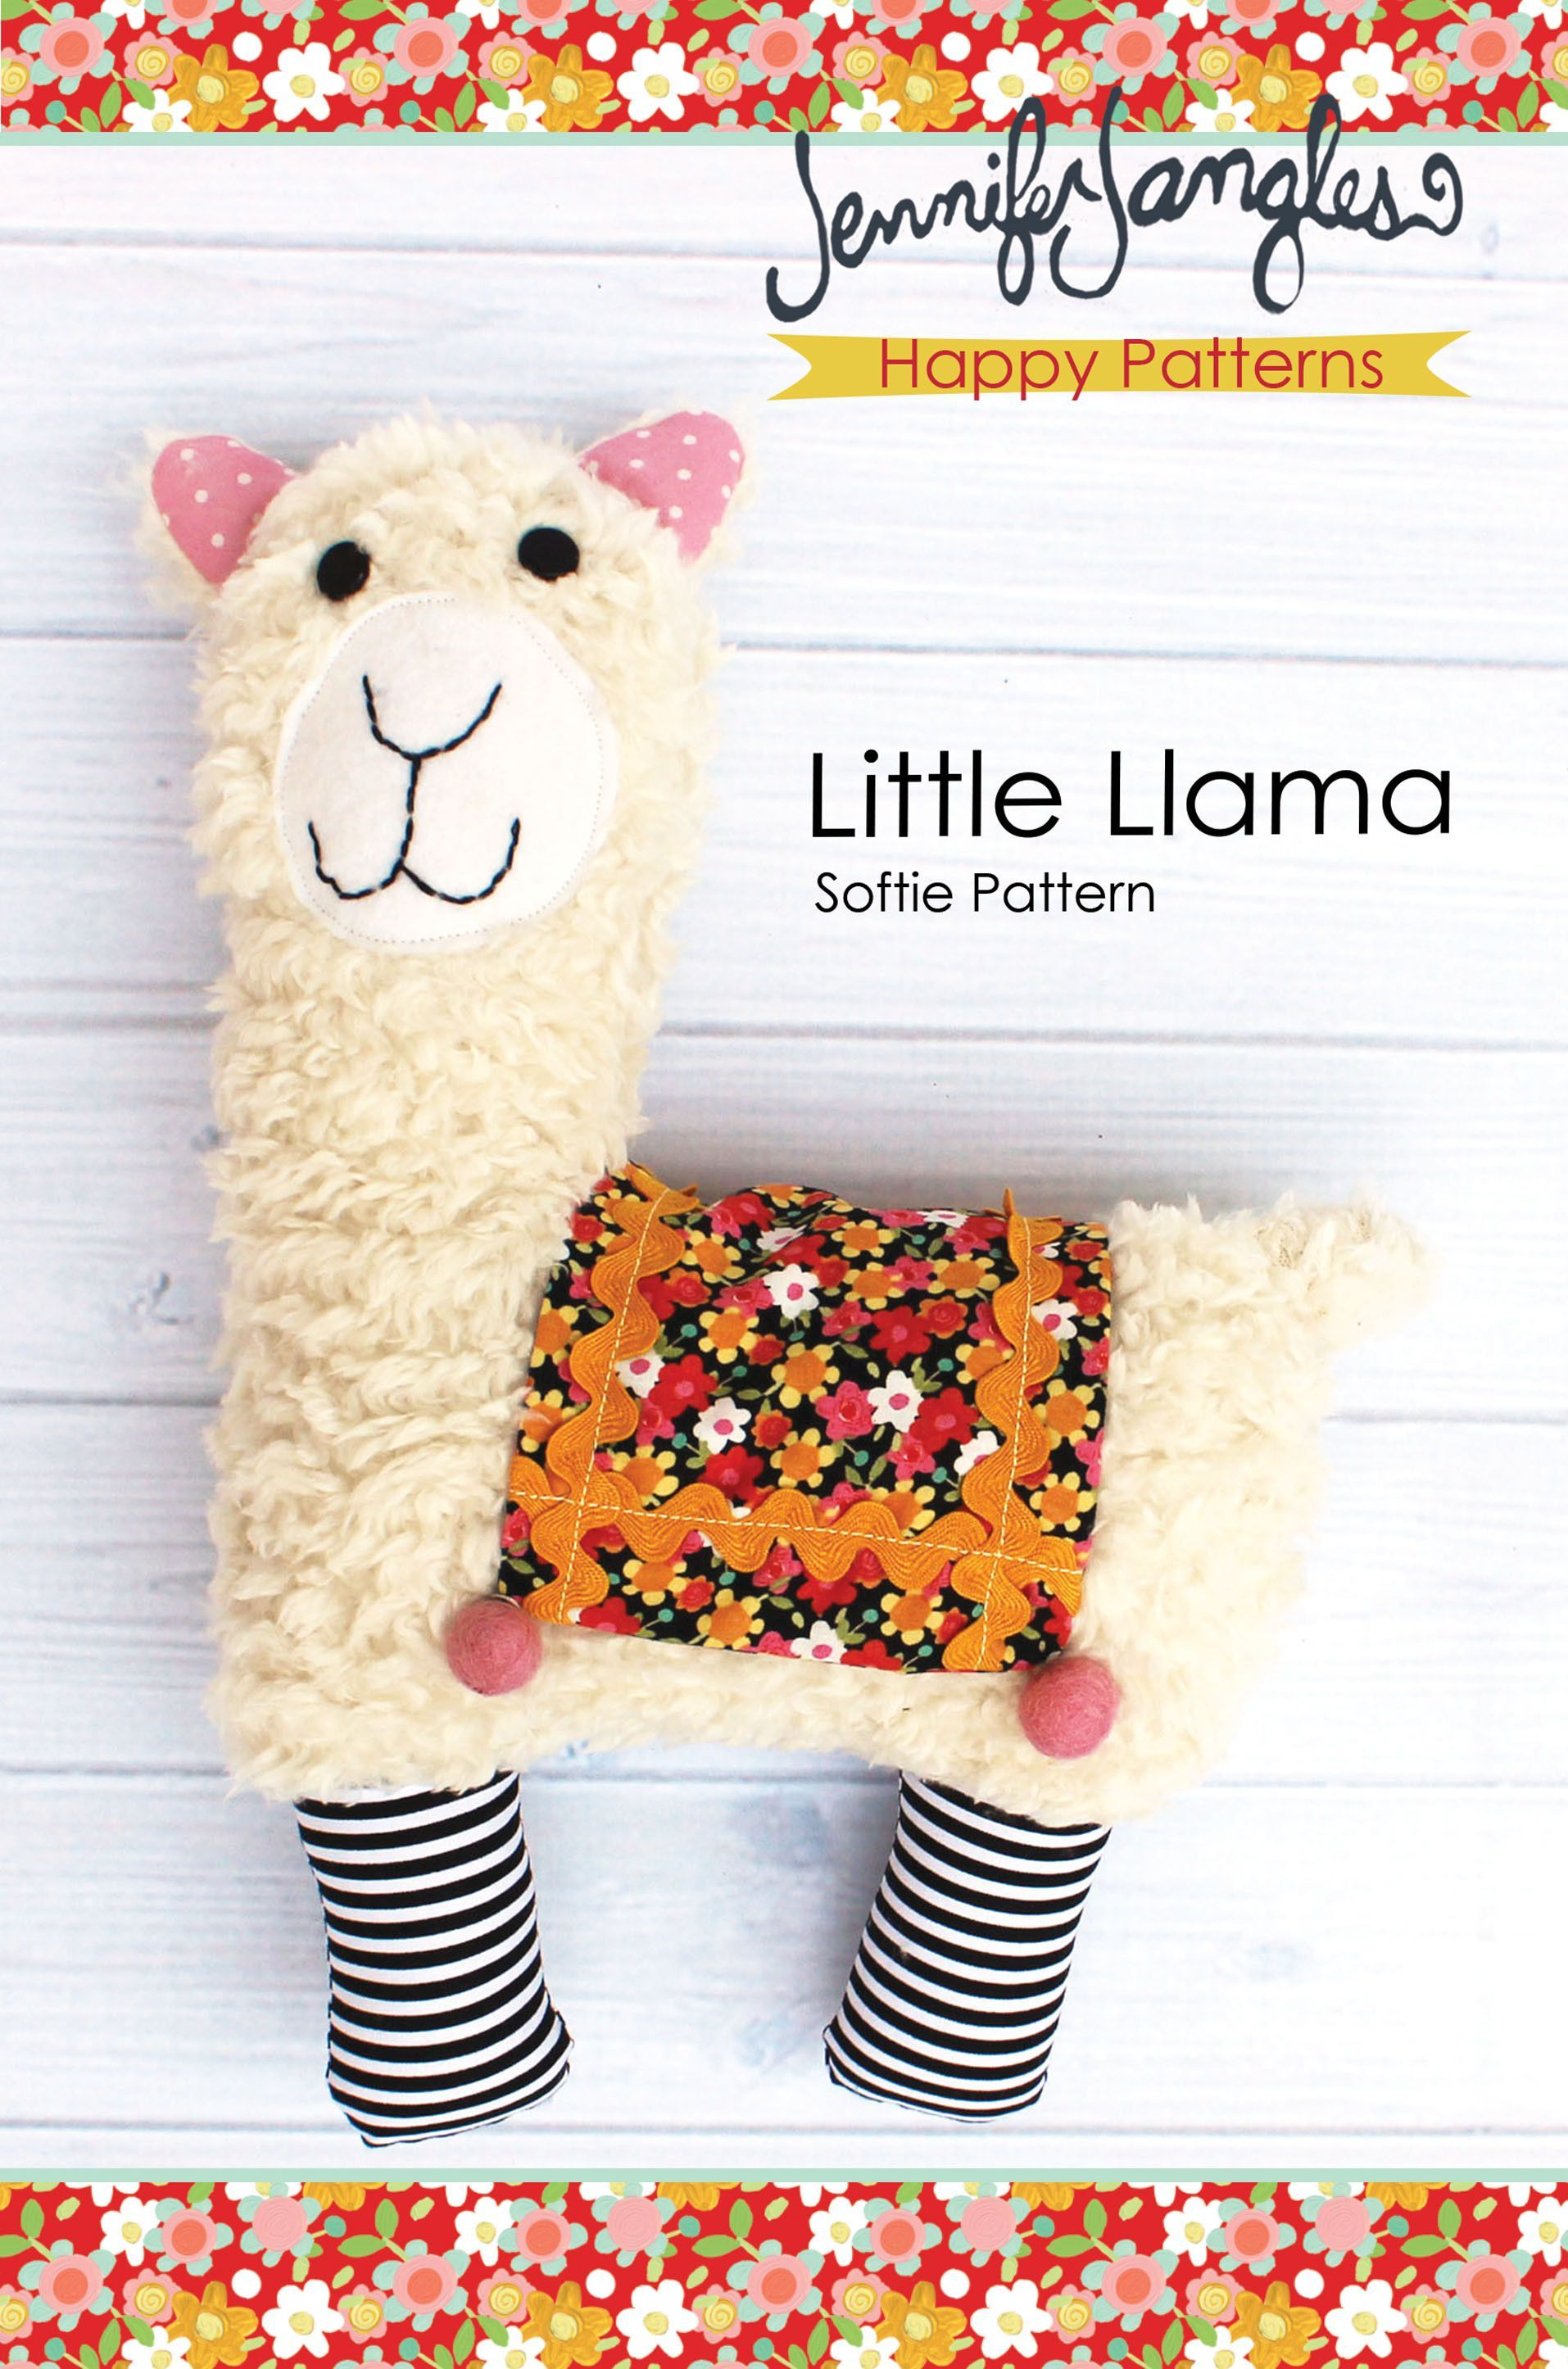 Little Llama Softie Pattern | Nähkästchen, Kuscheltiere und kreative ...